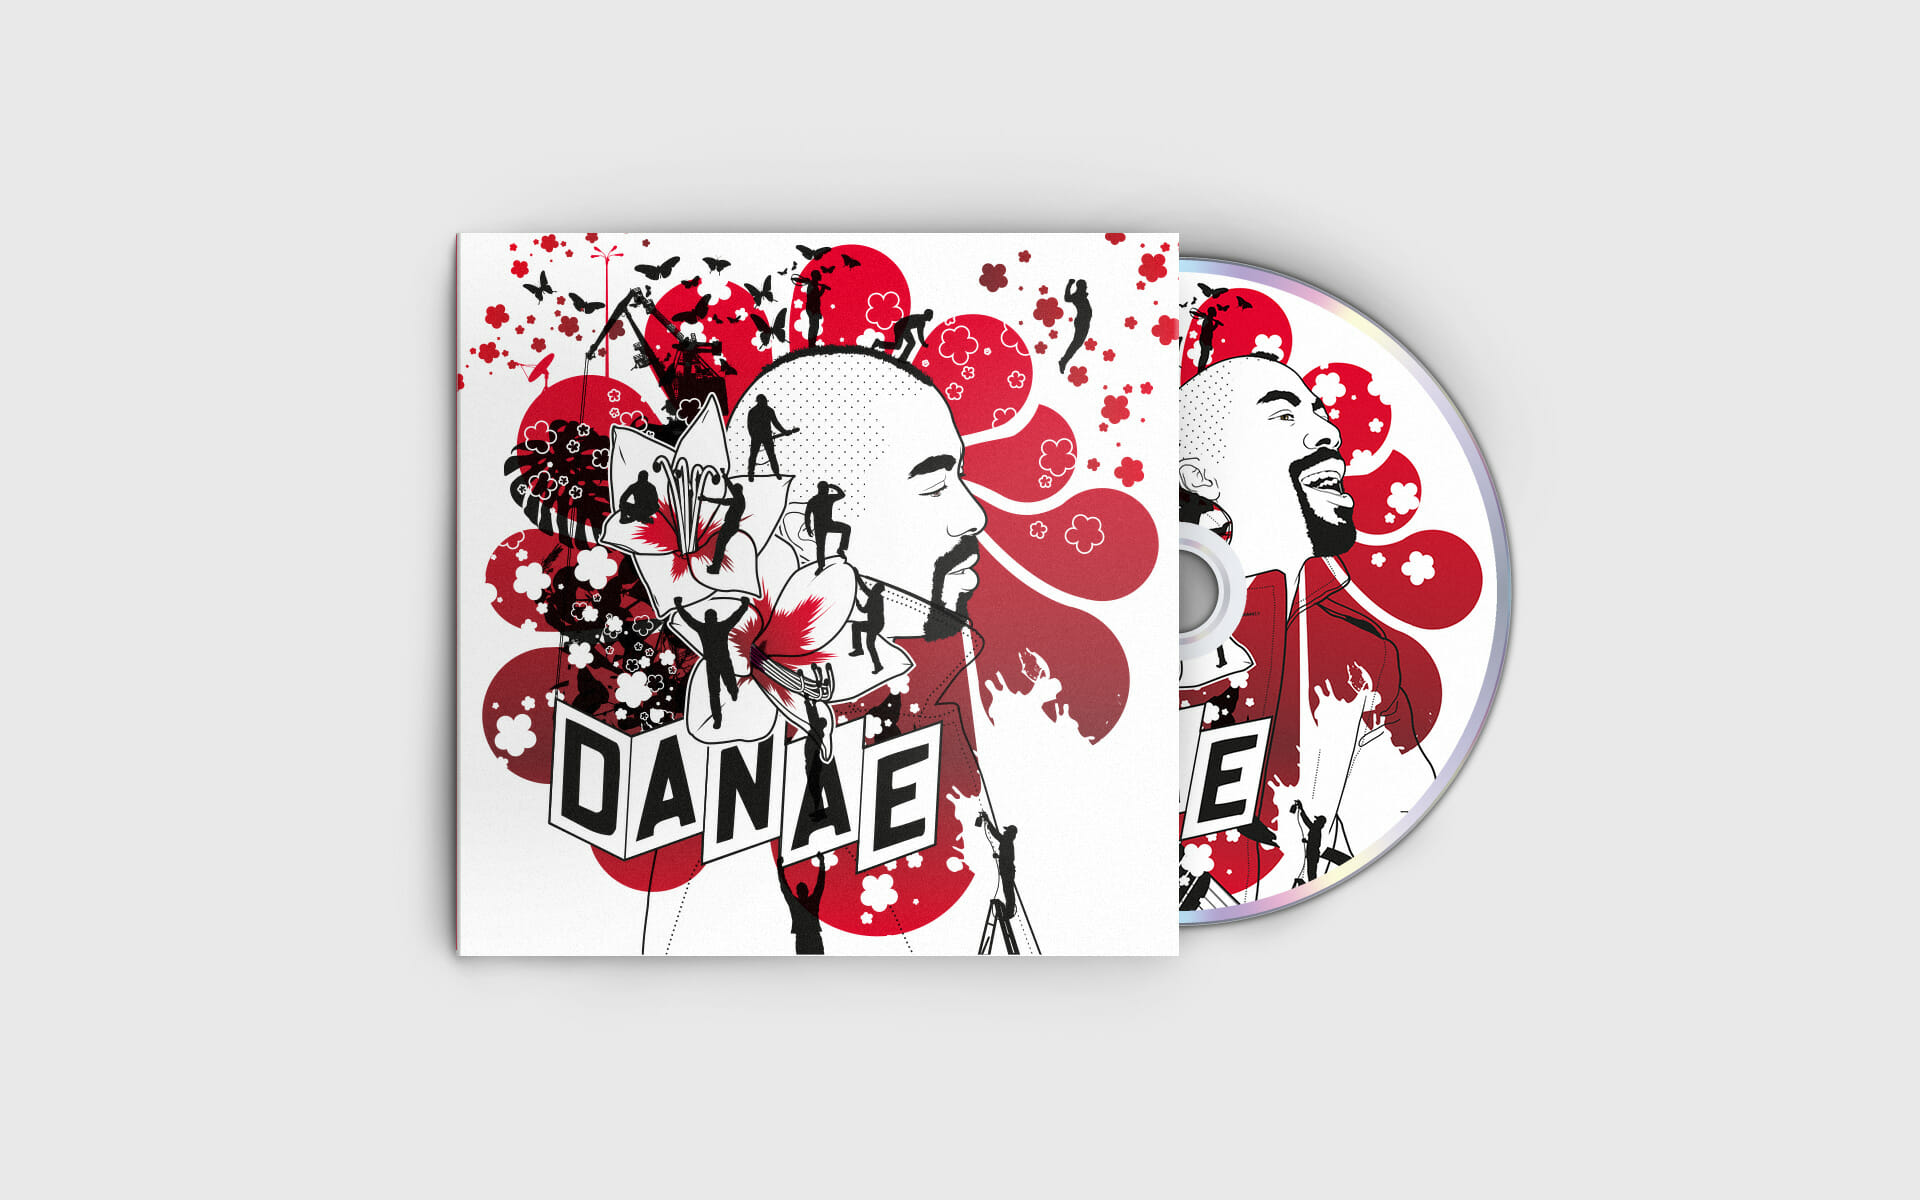 danae_Paris-Pap_cd